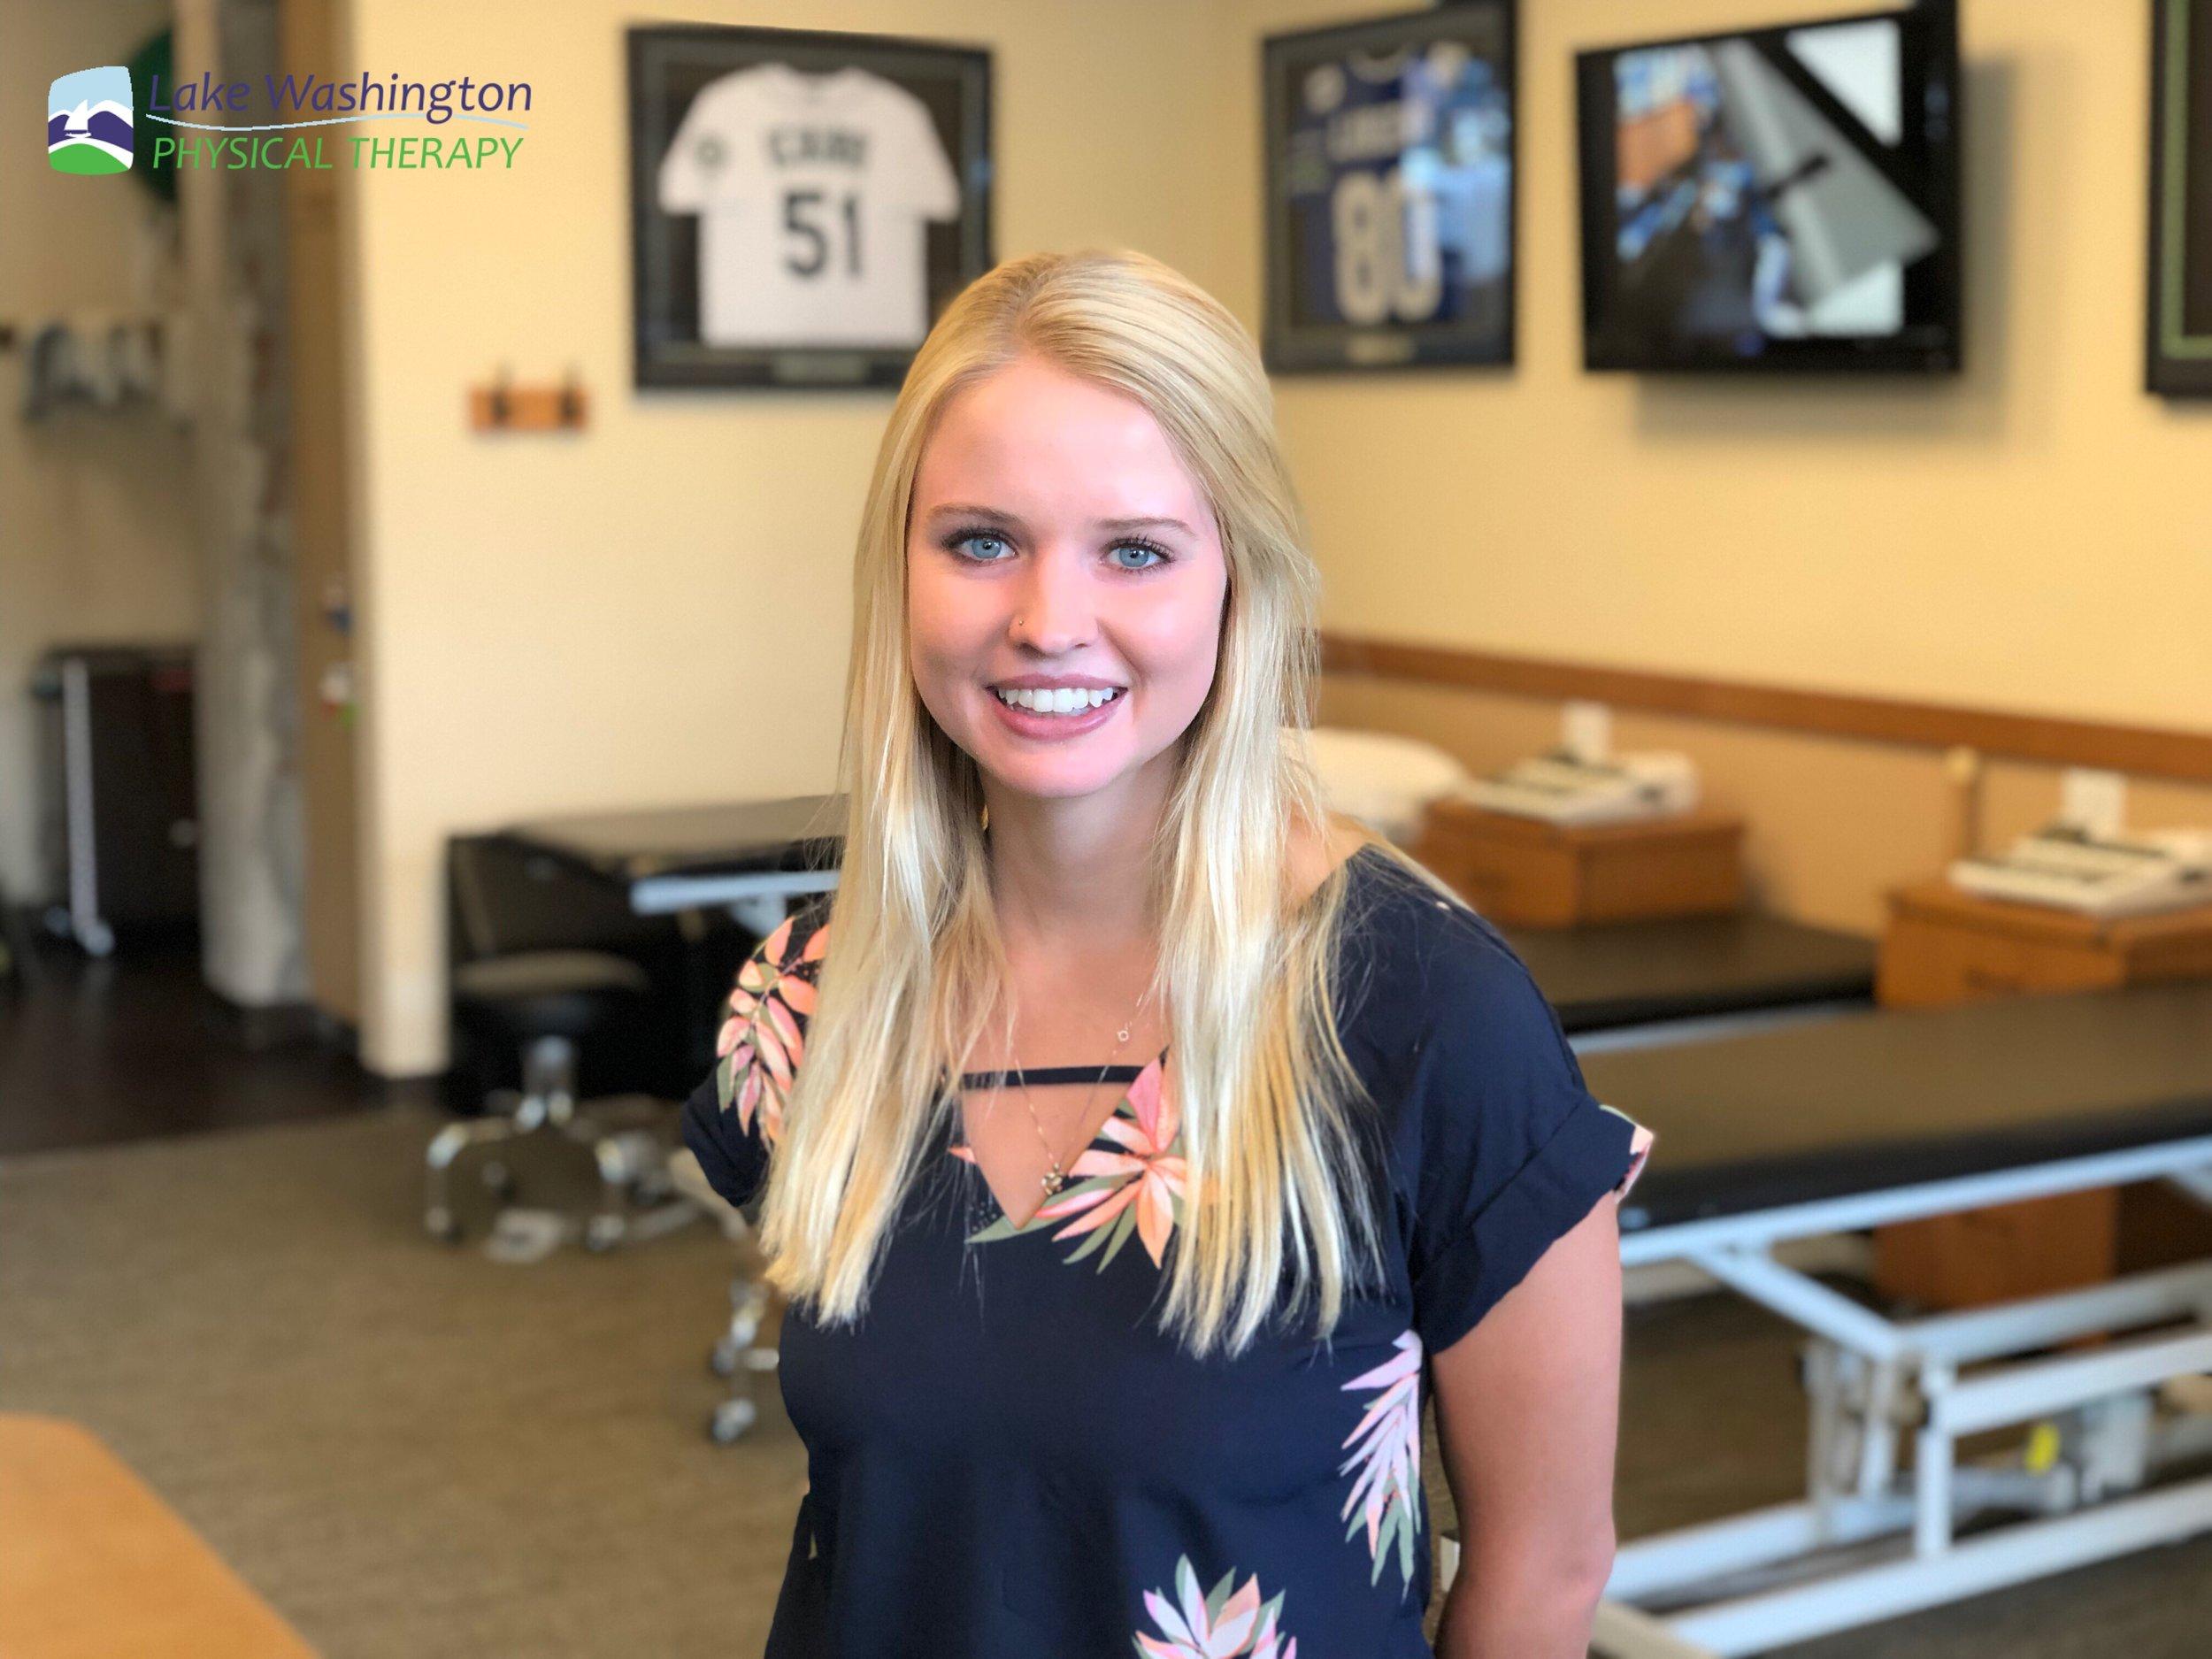 Anna LindquistSummer 2018 - High School: JuanitaCollege: Azusa Pacific UniversityPT Program: Azusa Pacific University